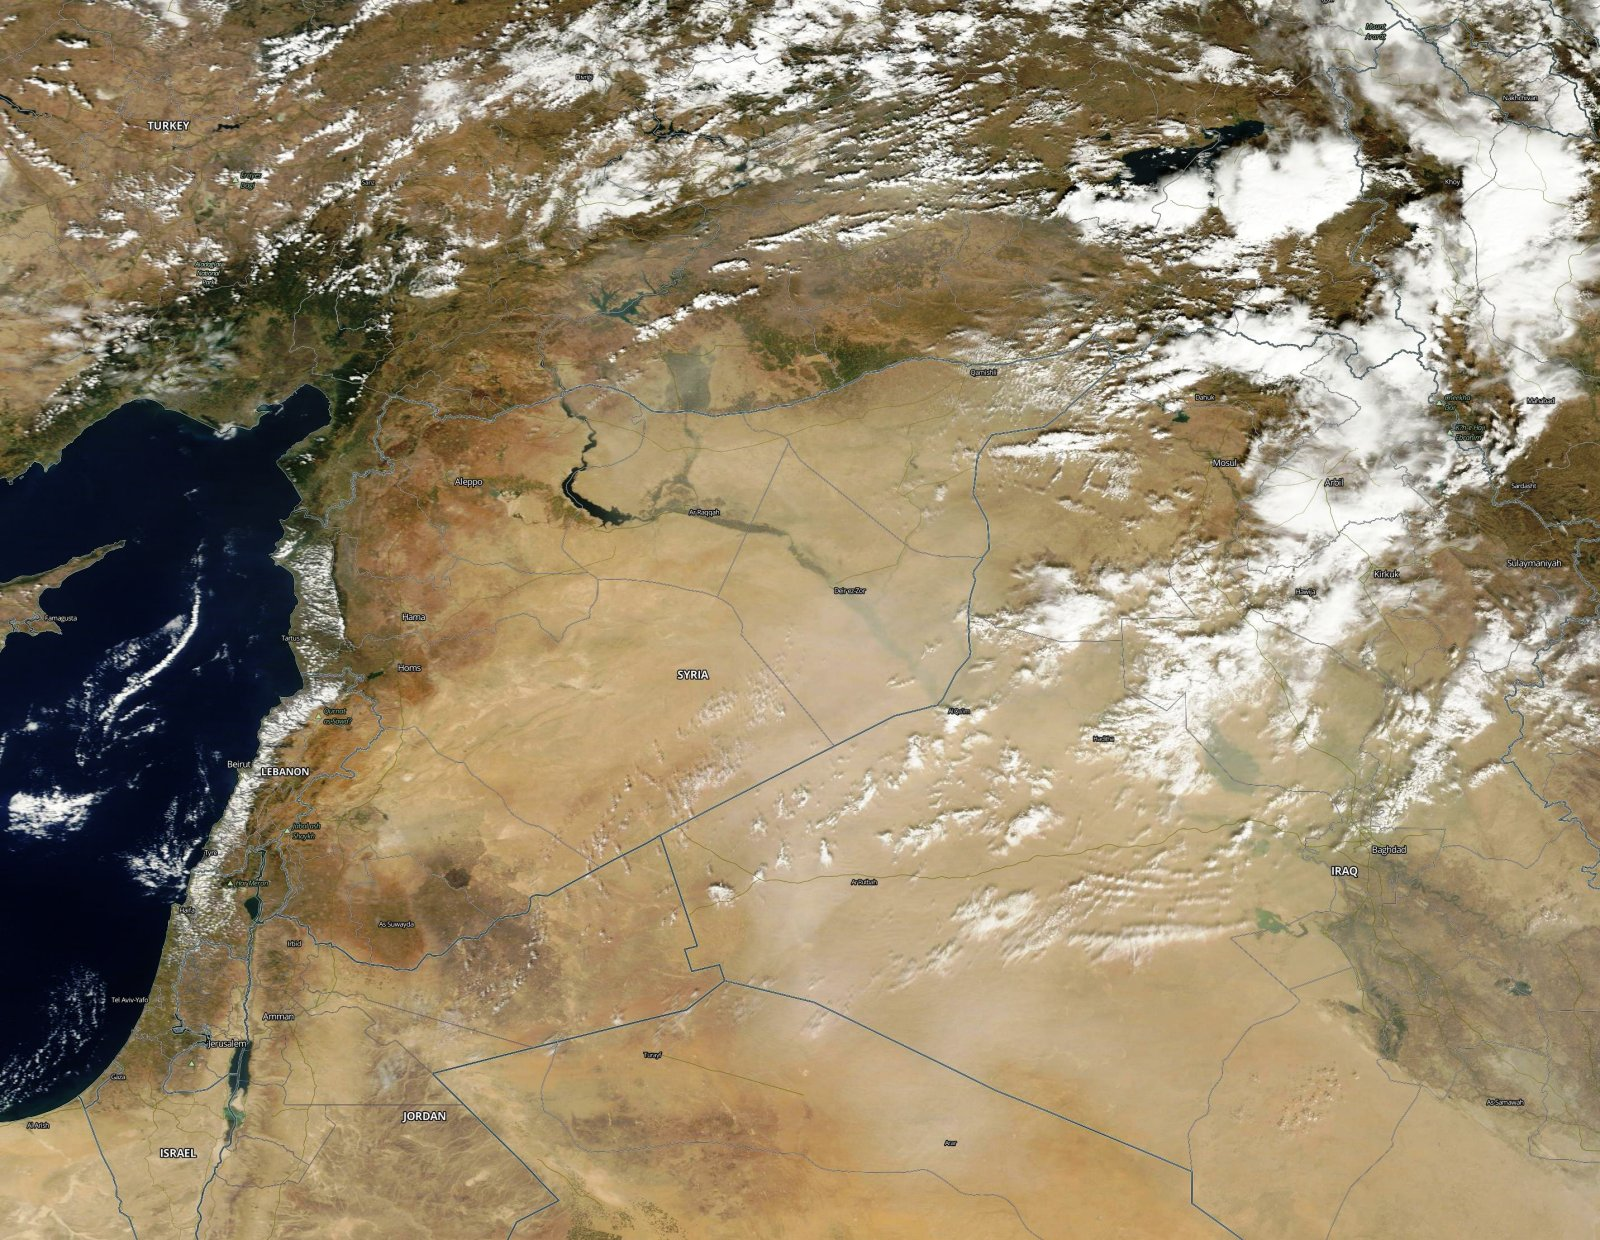 MODIS - Terra - Syrie - Frappes russes - Survol Turquie - Couverture nuageuse - F16 - Mig